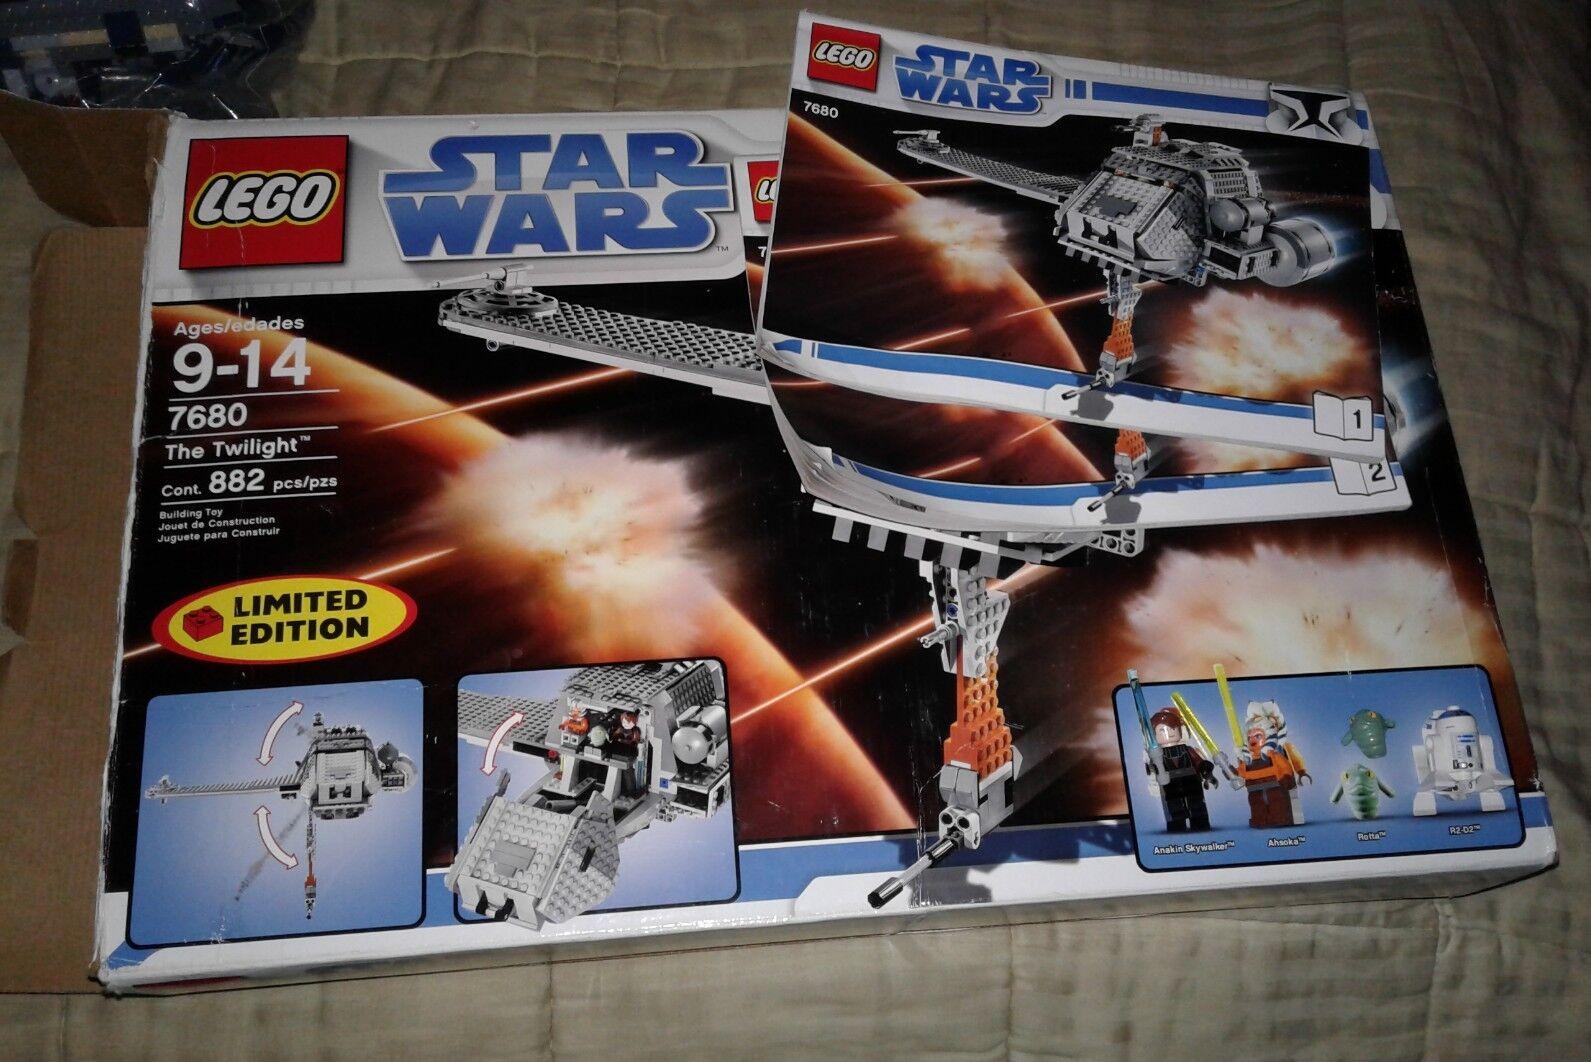 LEGO Star Wars Clone Wars The Twilight (7680) LIMITED EDITION SET